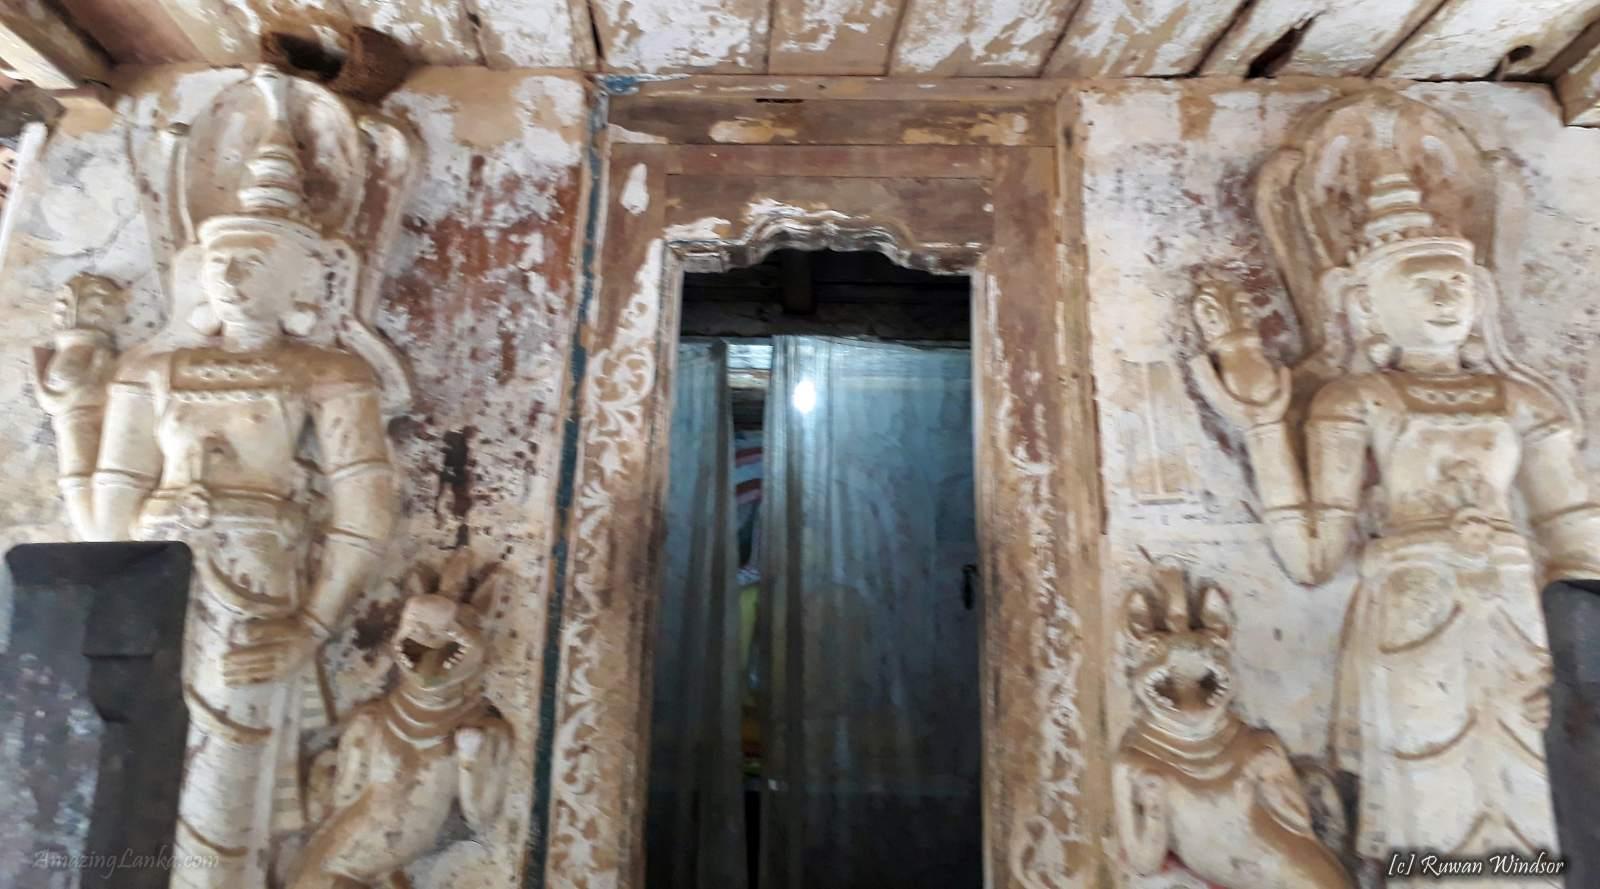 Indulgoda Sri Pushparamaya Tampita Rajamaha Viharaya - ඉඳුල්ගොඩ ශ්රී පුෂ්පාරාමය ටැම්පිට රජමහා විහාරය